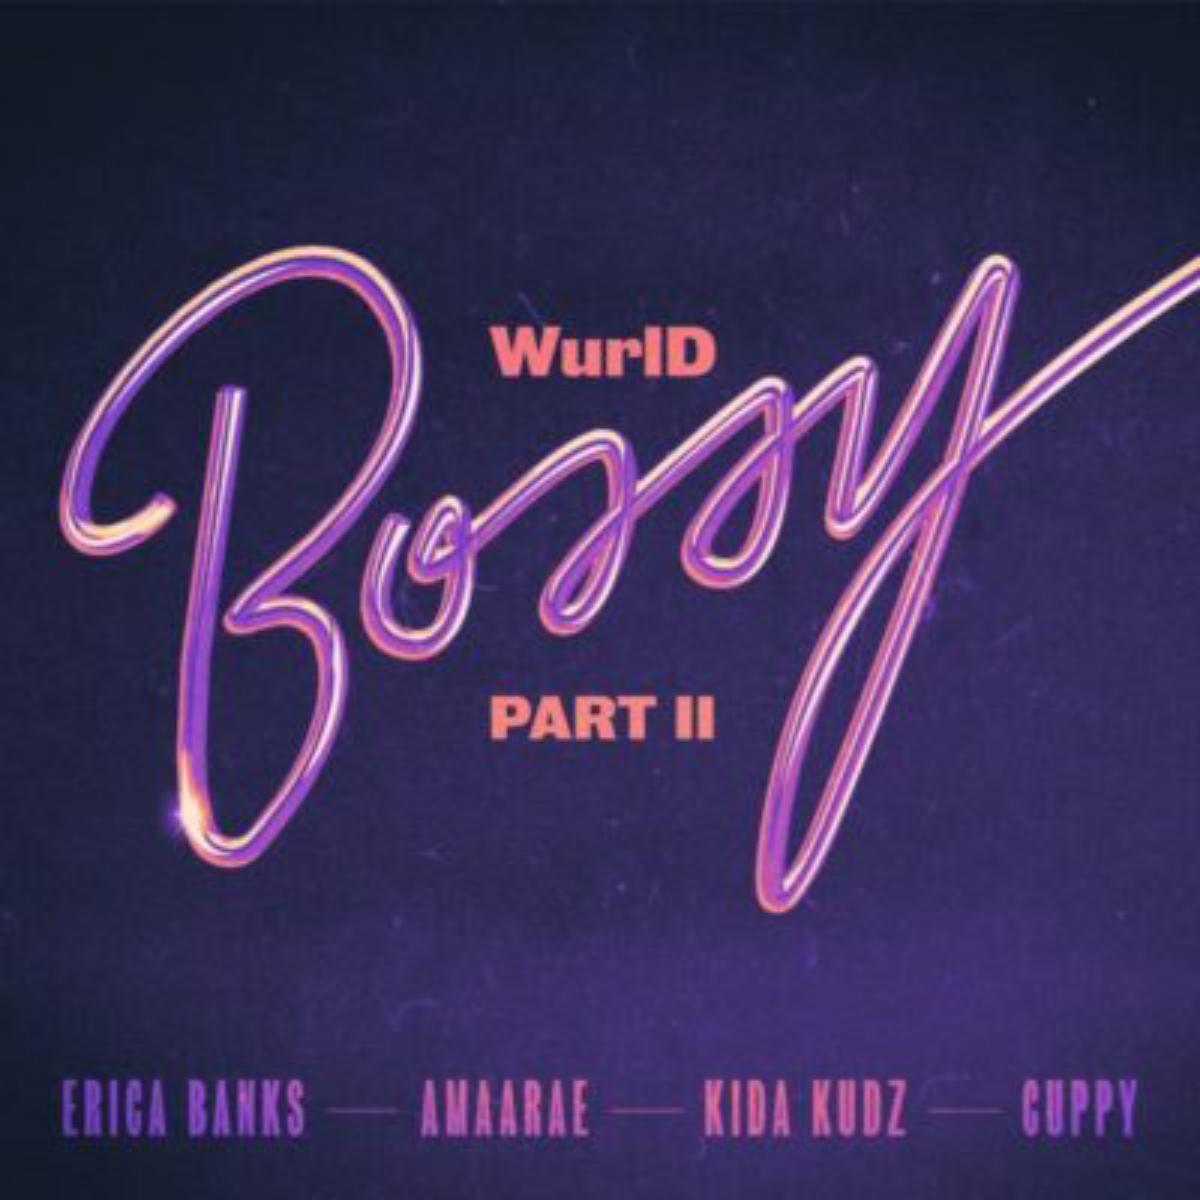 WurlD – Bossy (Remix) Ft. Kida Kudz, Cuppy, Amaarae, Erica Banks mp3 download